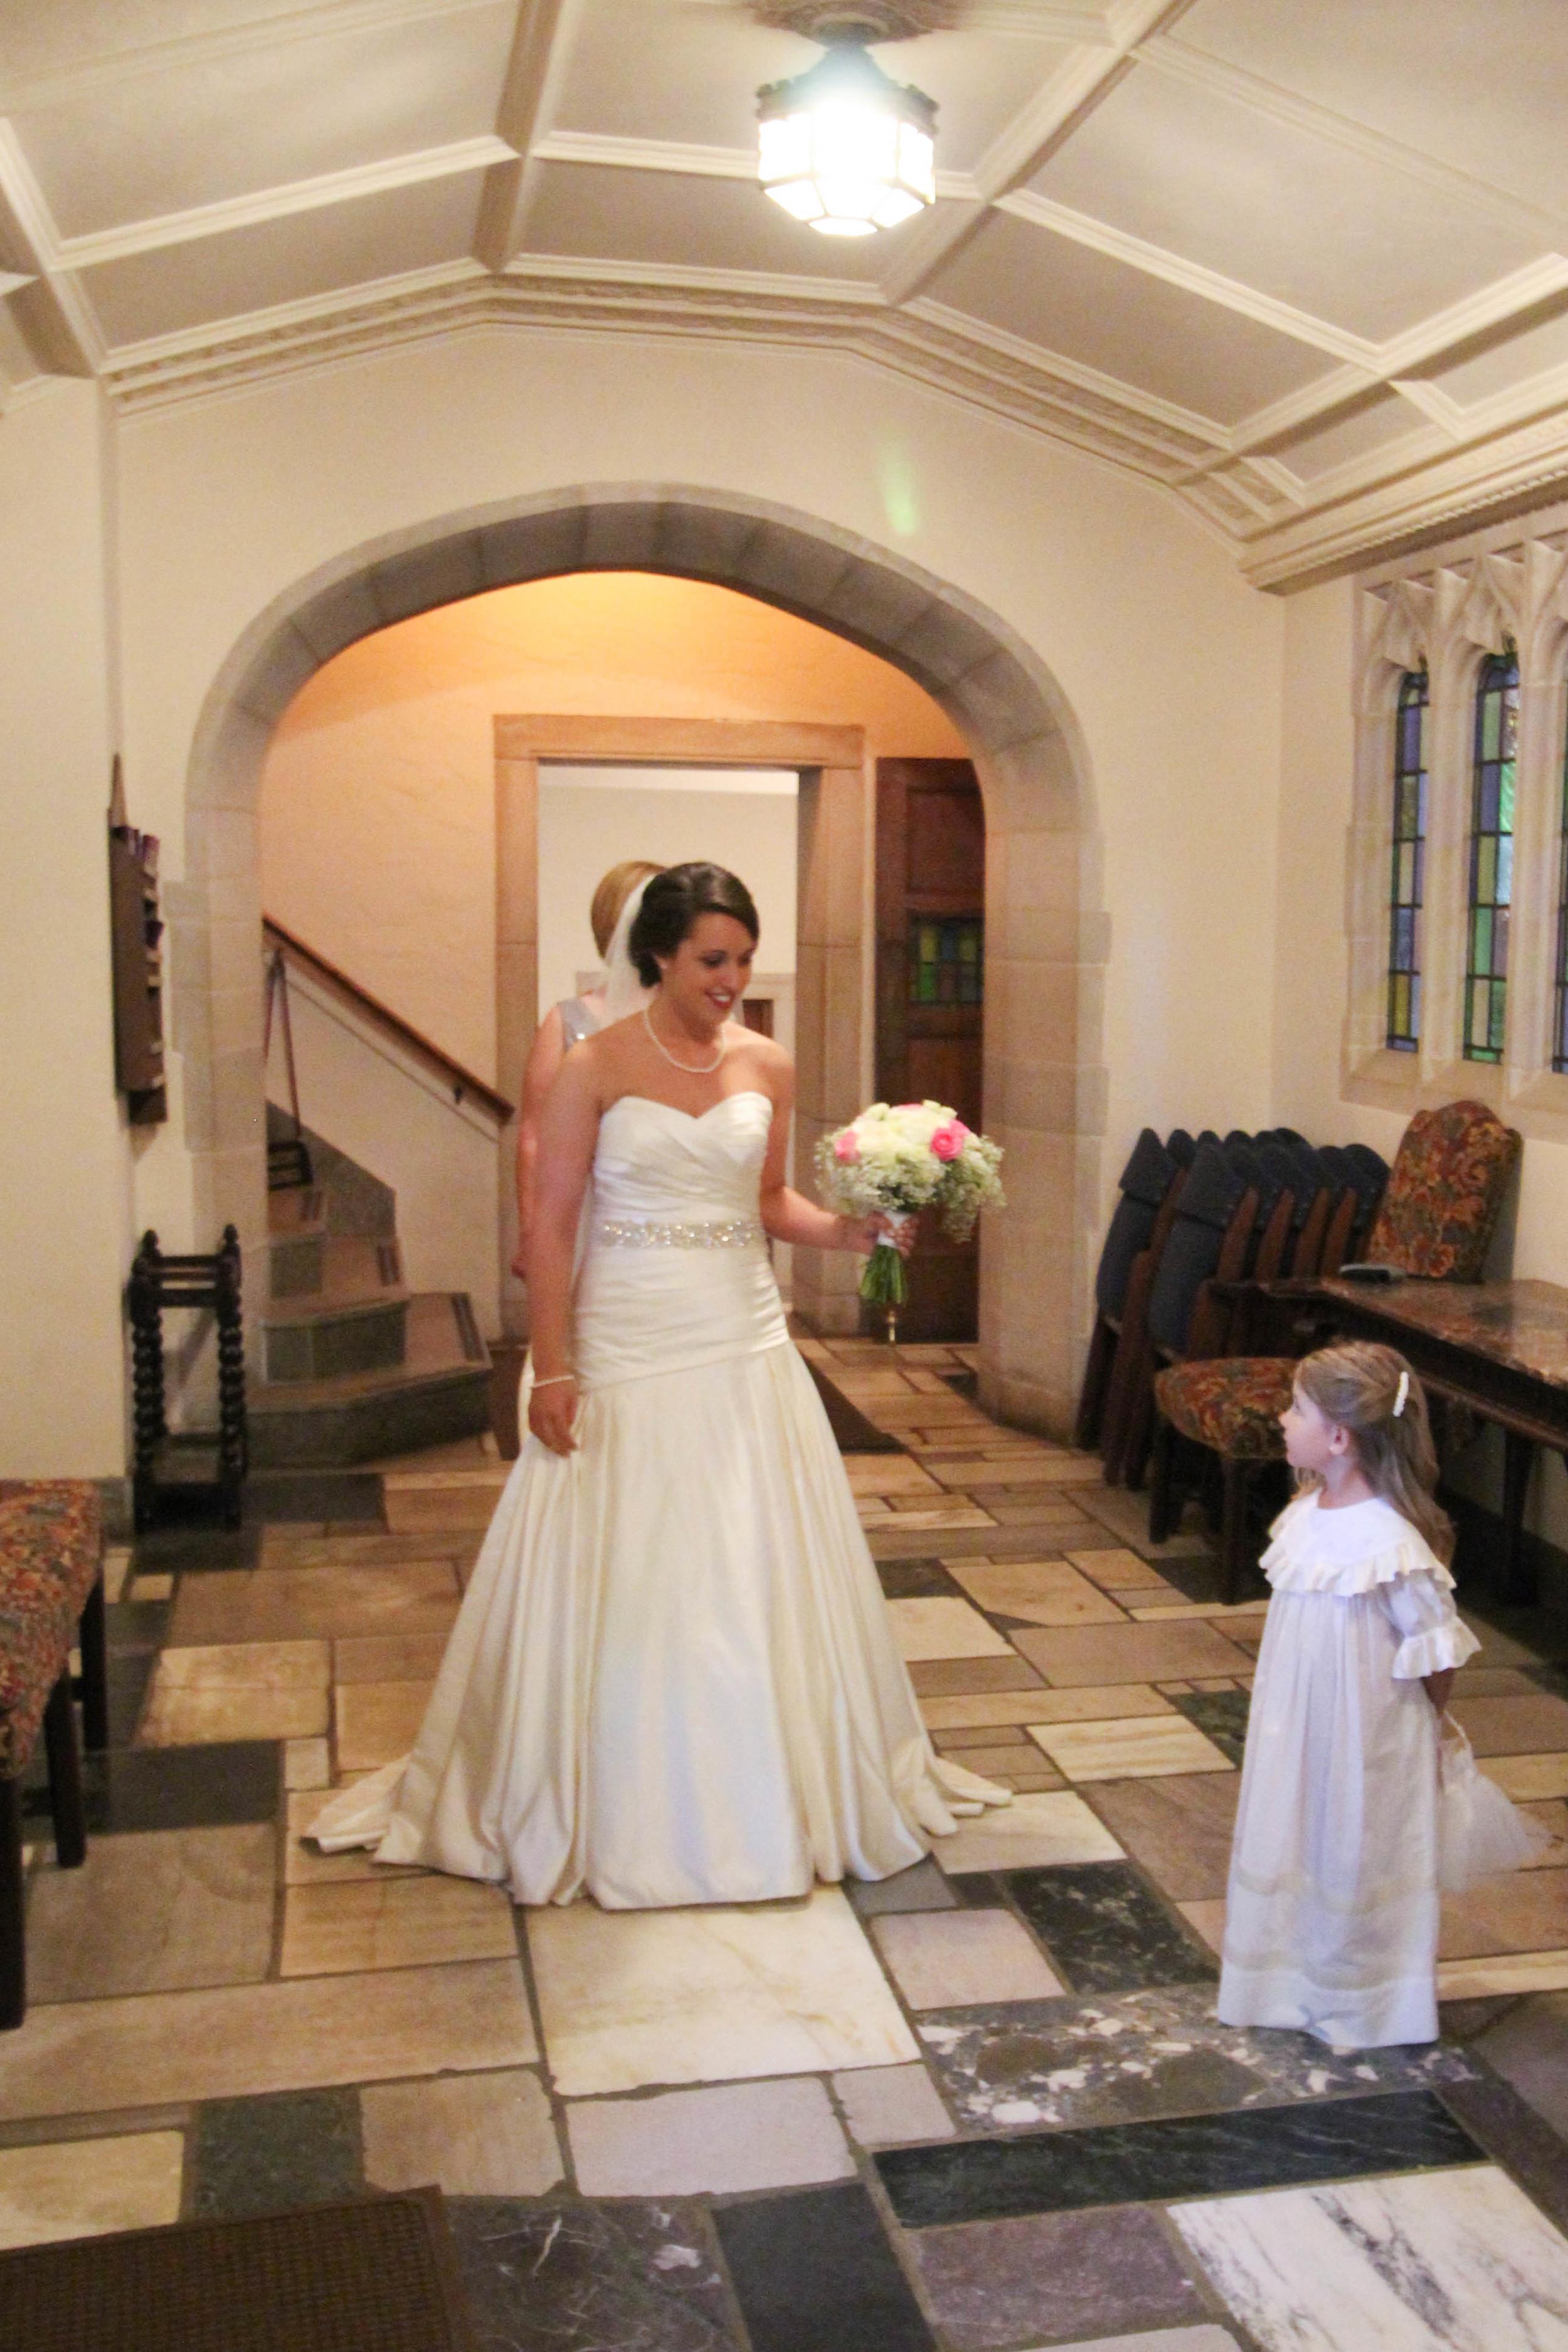 family-ceremony-136.jpg